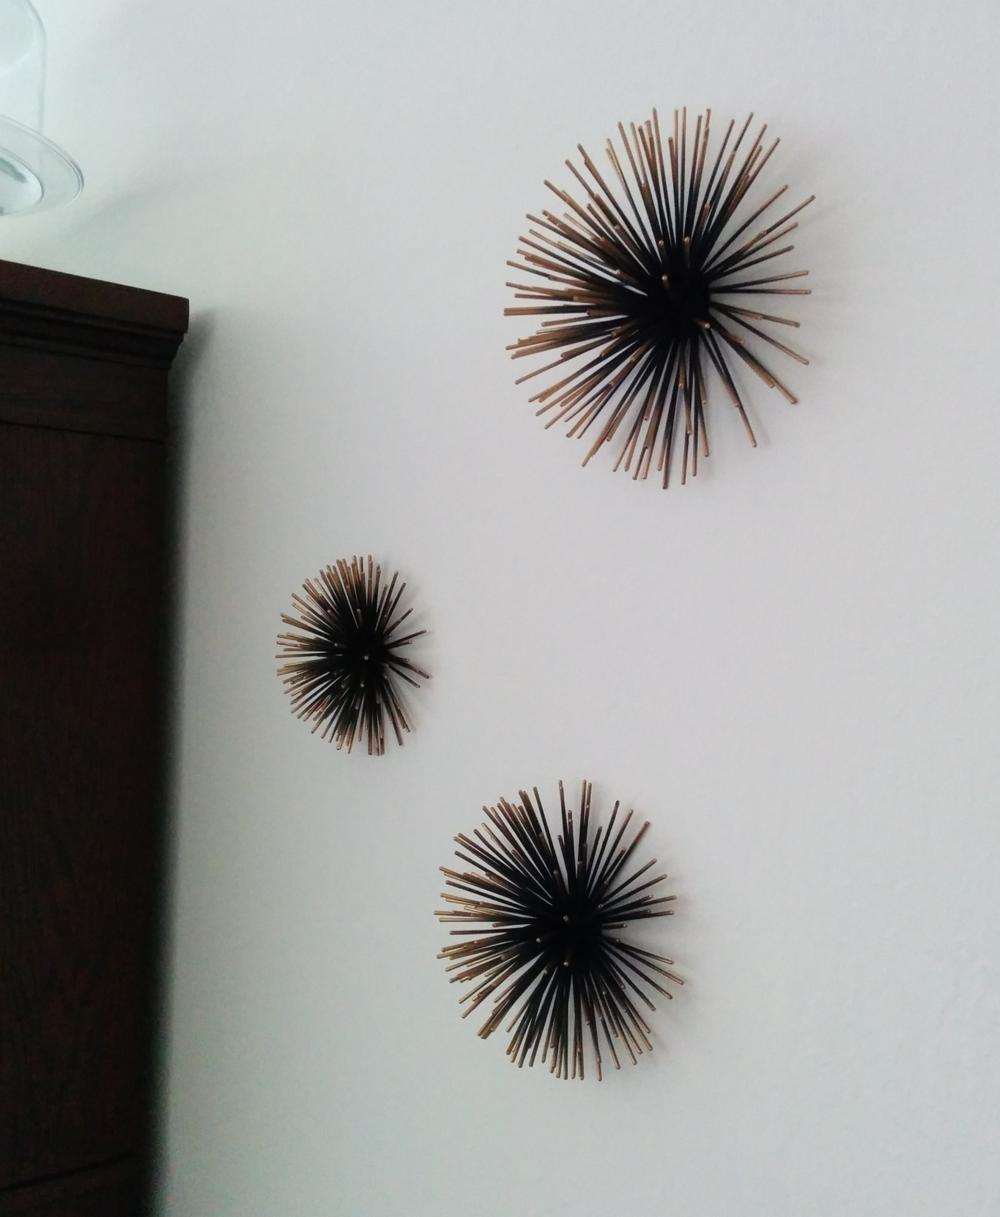 Metal Urchin Wall Decor : Let the walls do talking sofia s sabbatical